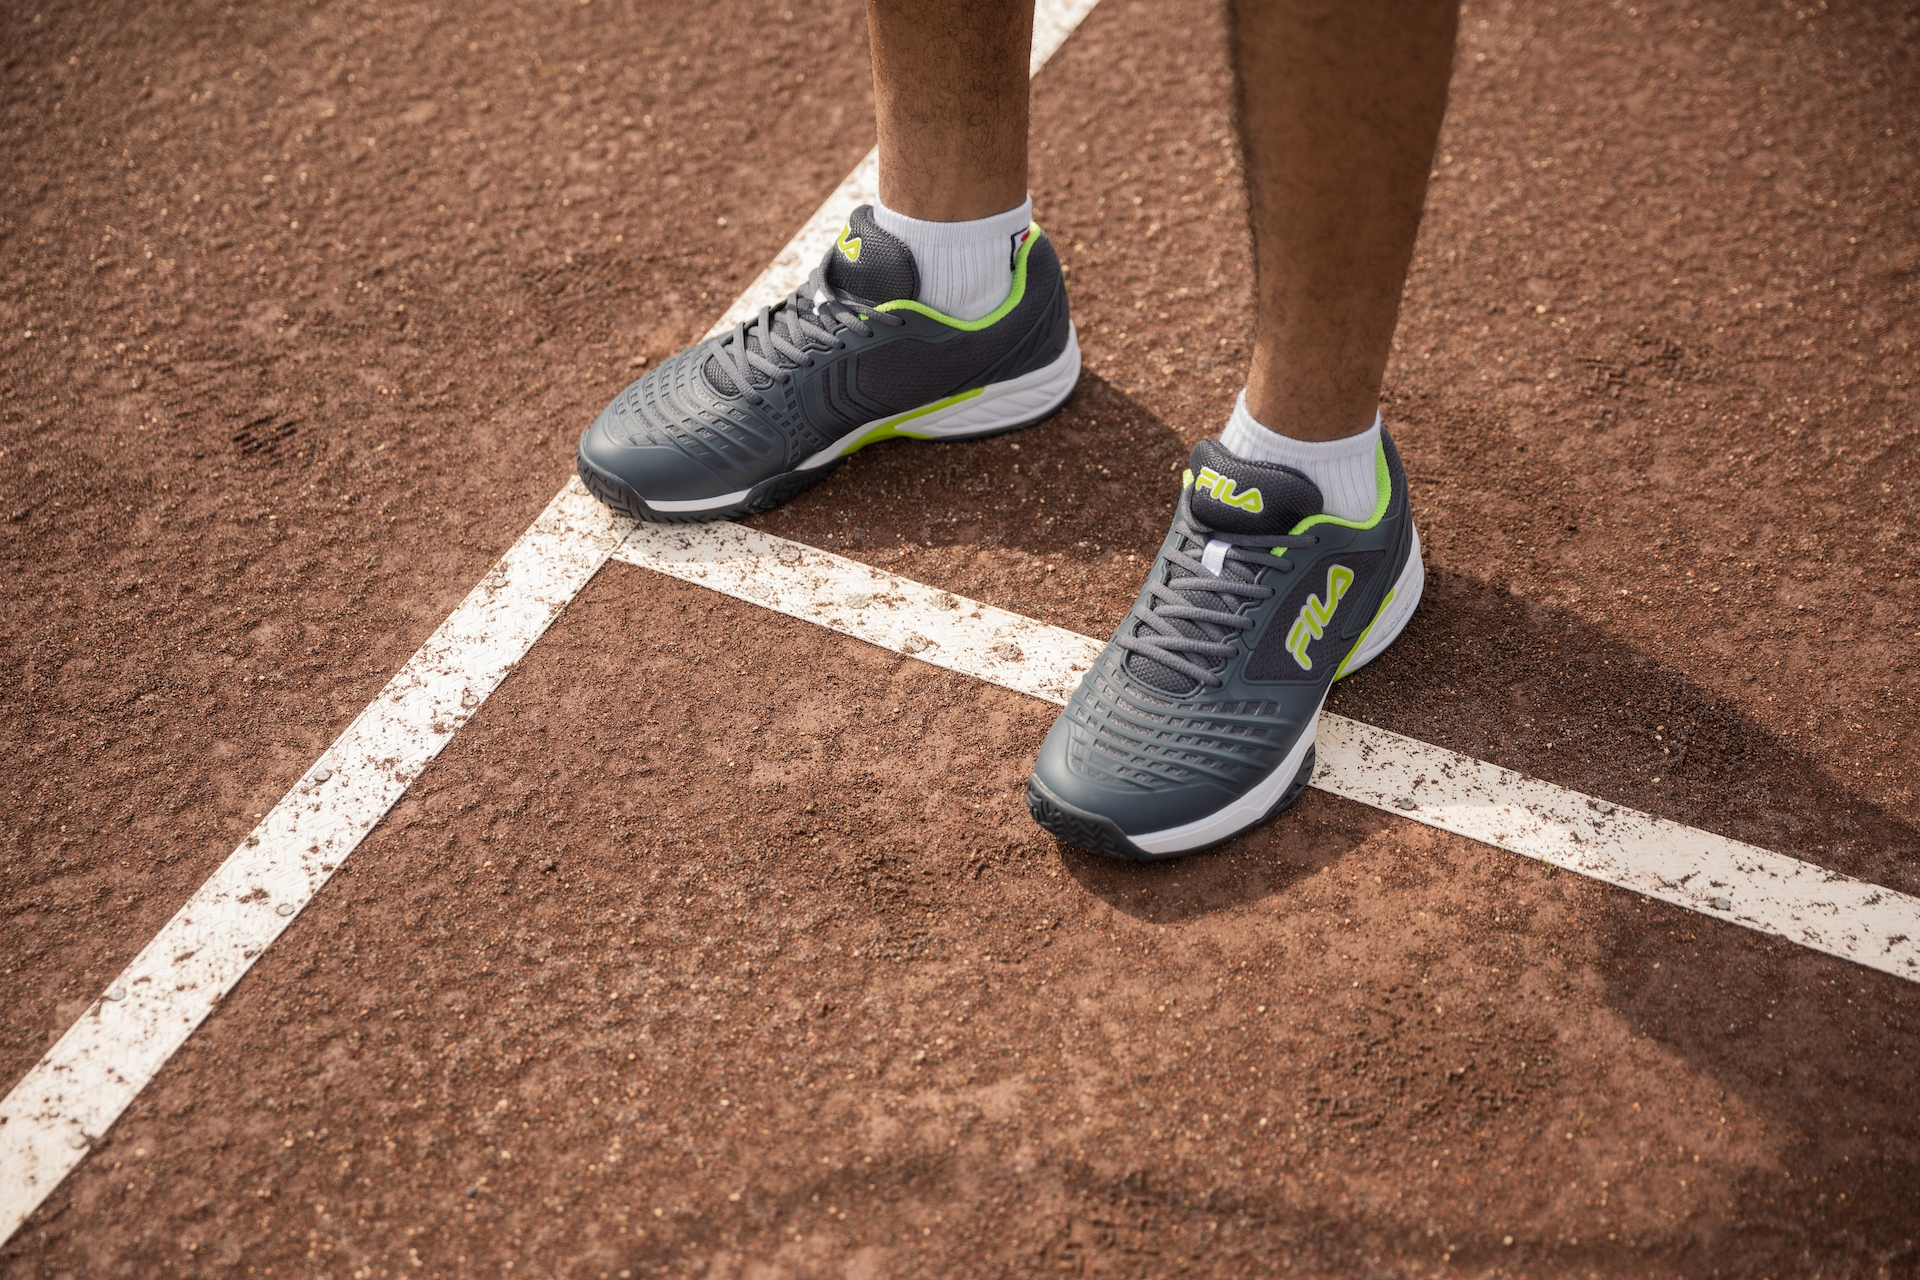 Axilus 2 Energized tennis shoe for men